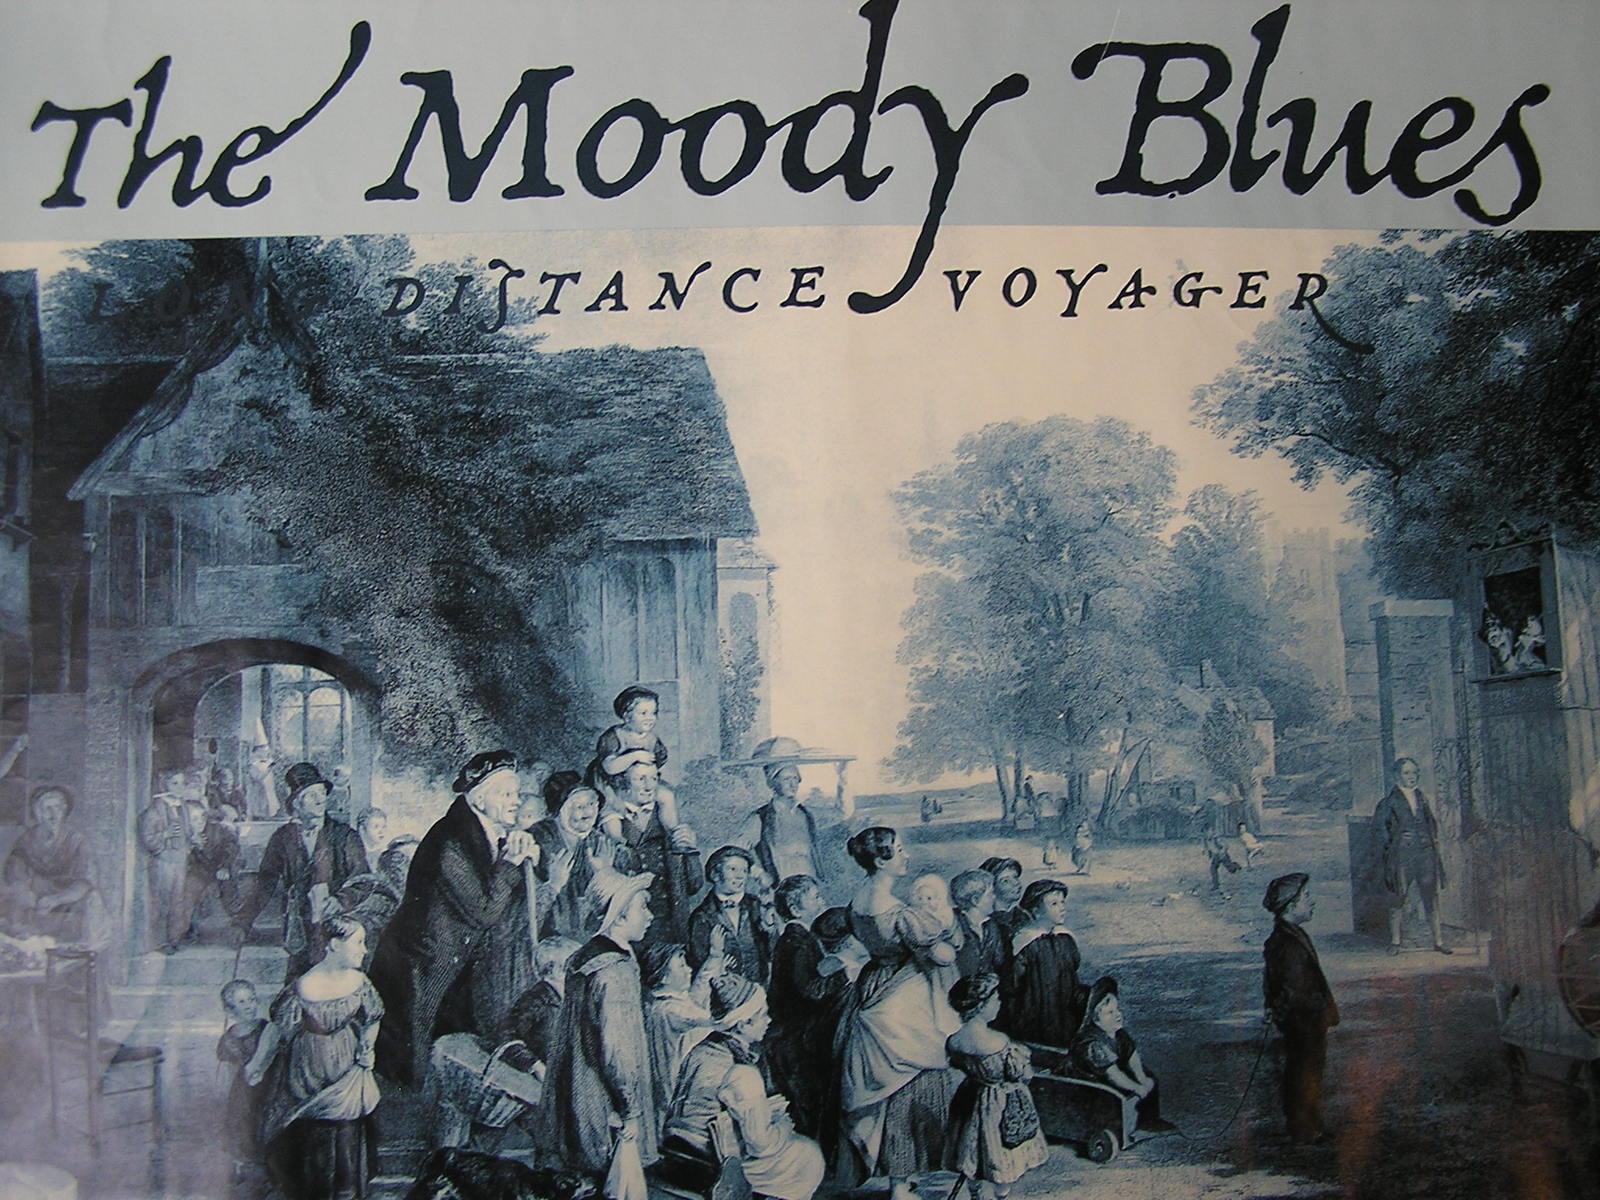 THE MOODY BLUES VINTAGE ORIGINAL CONCERT TOUR CLOTH BACKSTAGE PASS